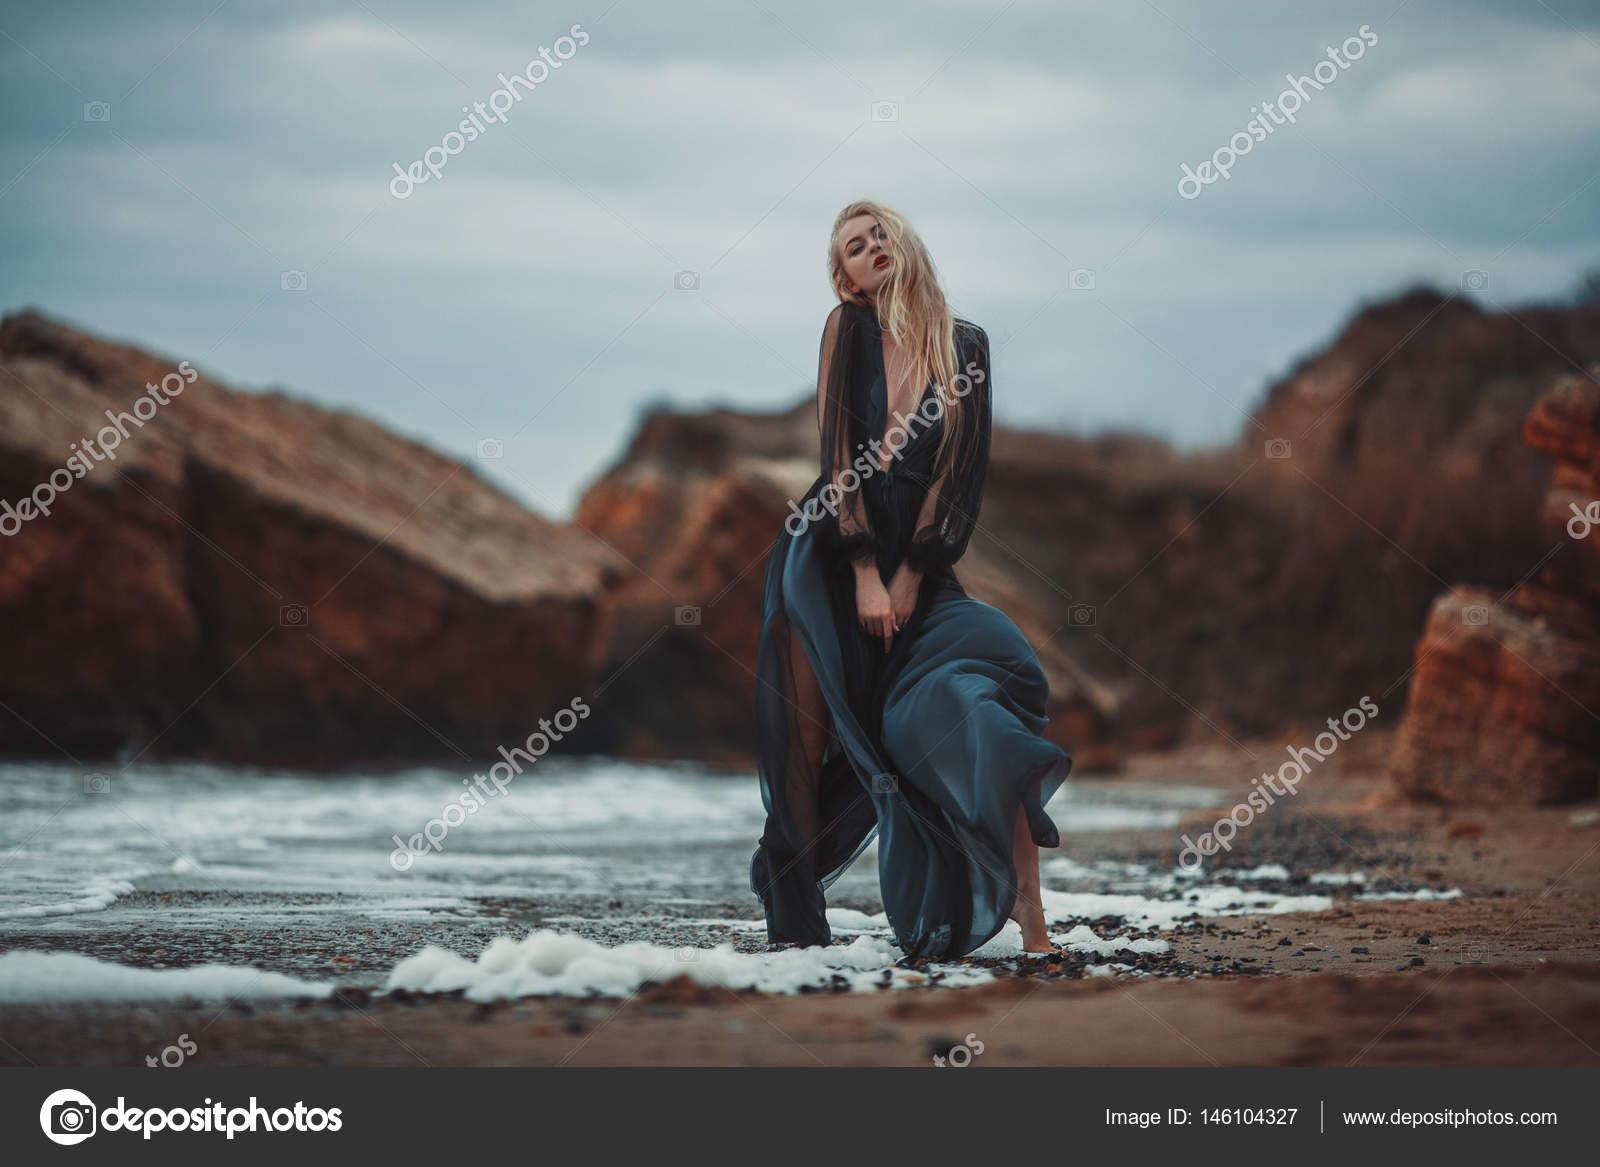 5c00153b092 Νεαρή γυναίκα στο μακρύ διάφανο μαύρο φόρεμα μεταξύ παραλία και τη θάλασσα.  Άνεμος φυσάει στρίφωμα, φόρεμα — Εικόνα από ...